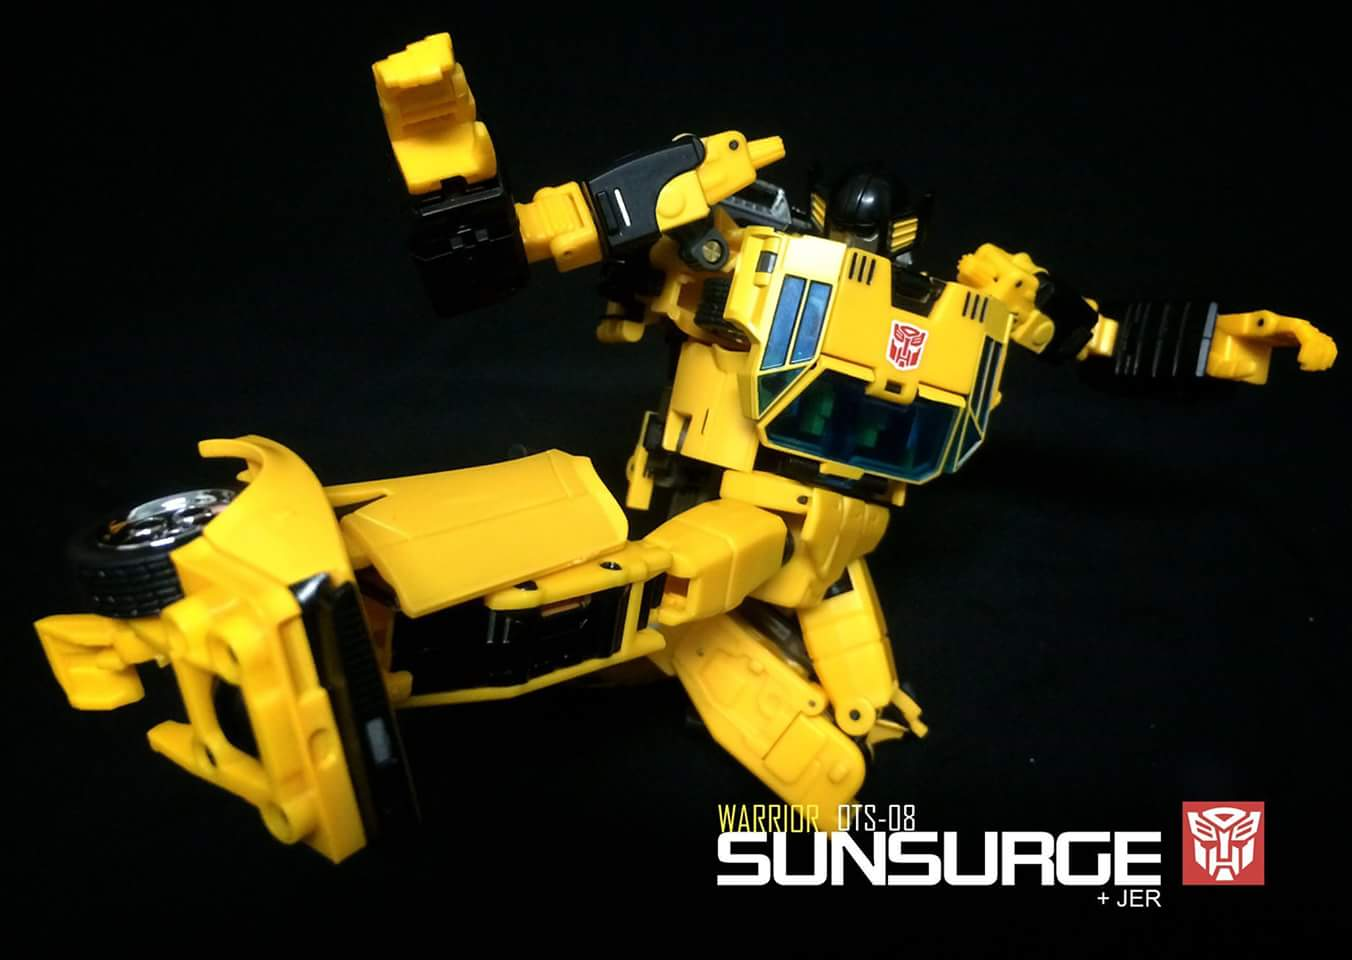 [BadCube] Produit Tiers - OTS-08 Sunsurge (aka Sunstreaker/Solo G1) + OTS-Special 01 Blaze (aka Sunstreaker/Solo Diaclone) - Page 3 JdWYnoAN